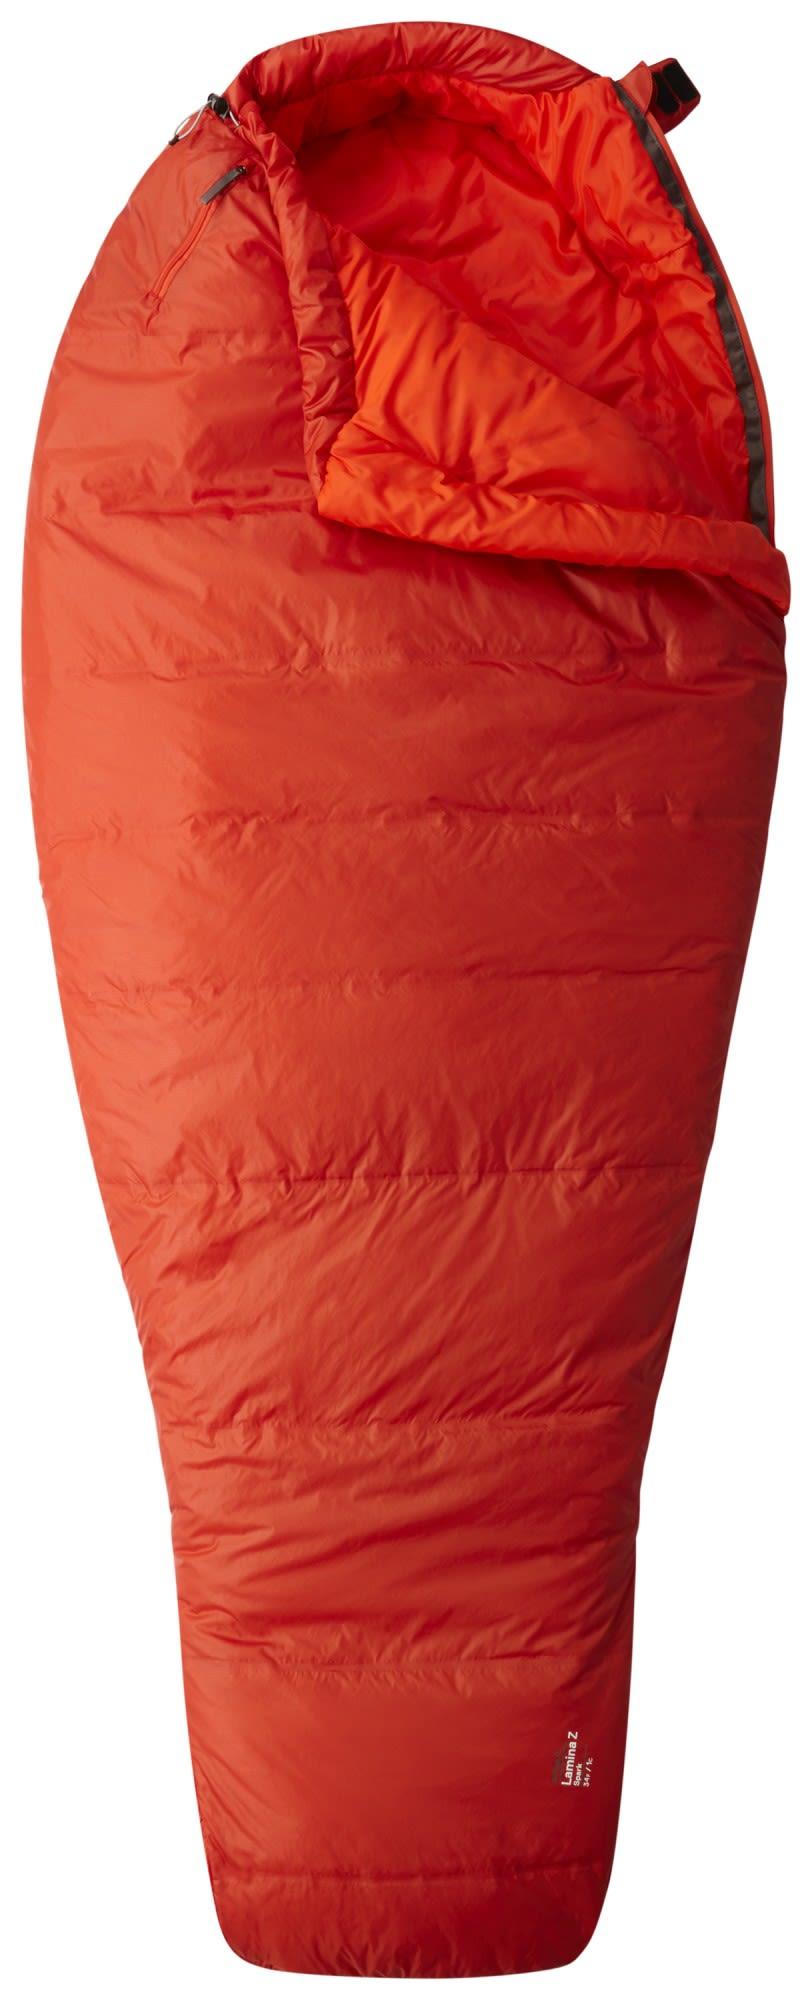 Mountain Hardwear Lamina Z Spark Long Rot, 213 cm -RV links -Farbe Flame, 213 cm